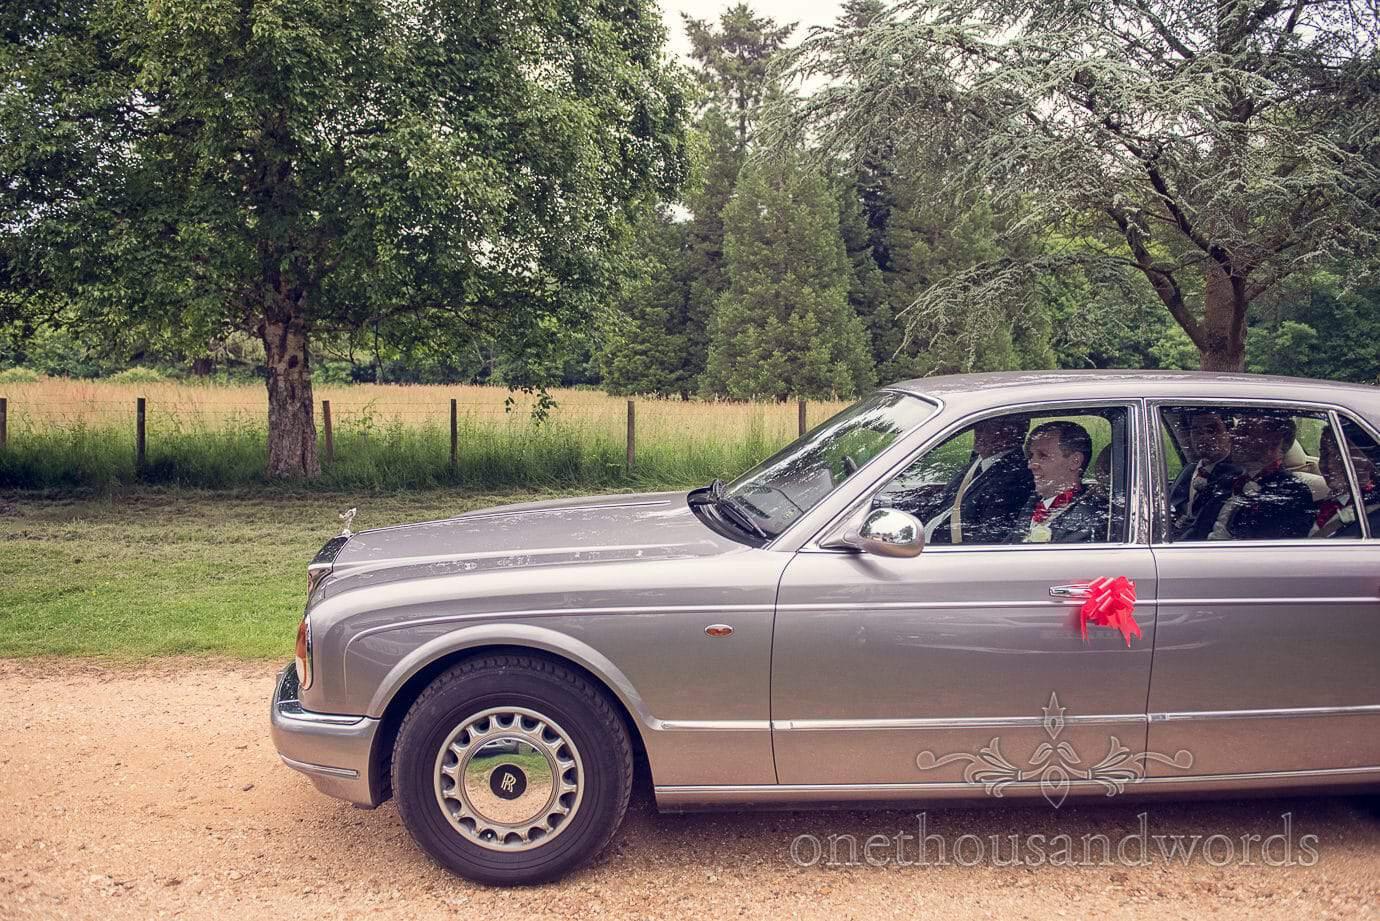 Groom and groomsmen travel to church wedding in grey Rolls Royce